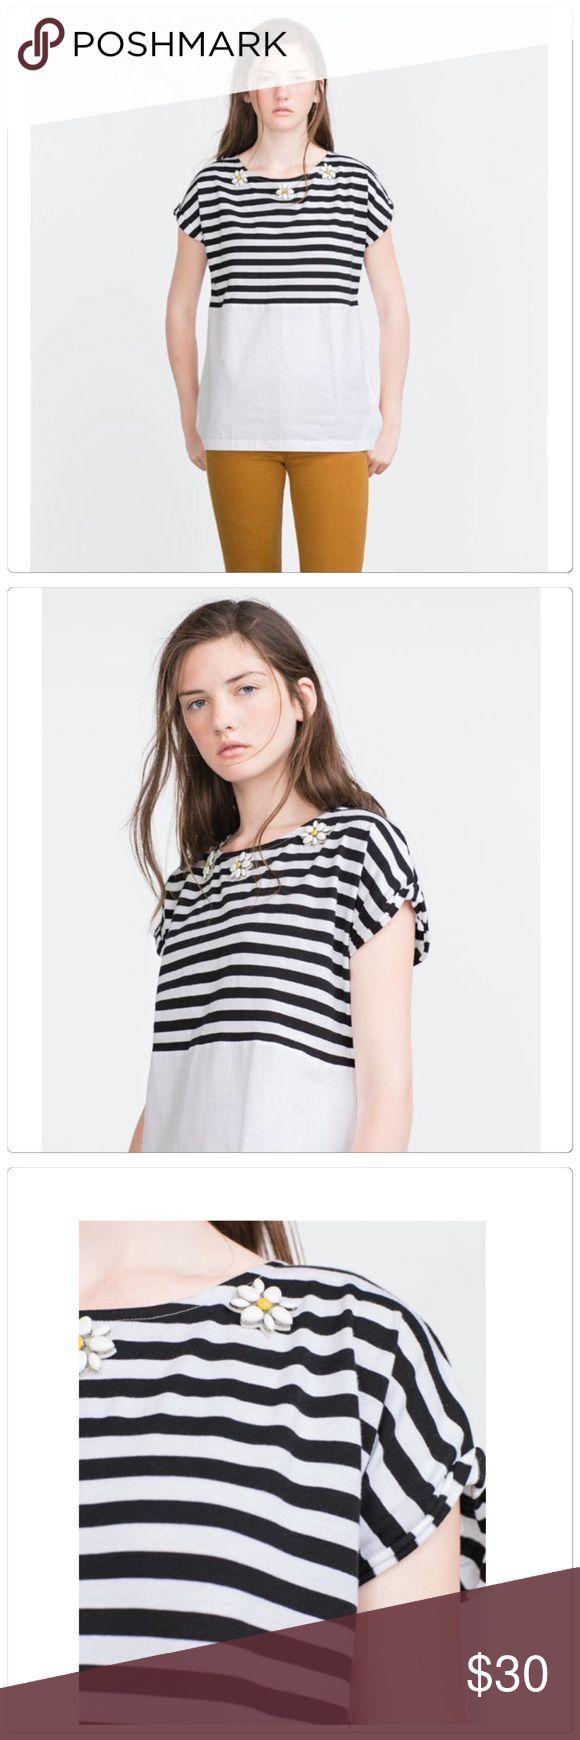 🆕 Zara mix media floral stripe top Zara mix media floral stripe top. Size S. Brand new. Zara Tops